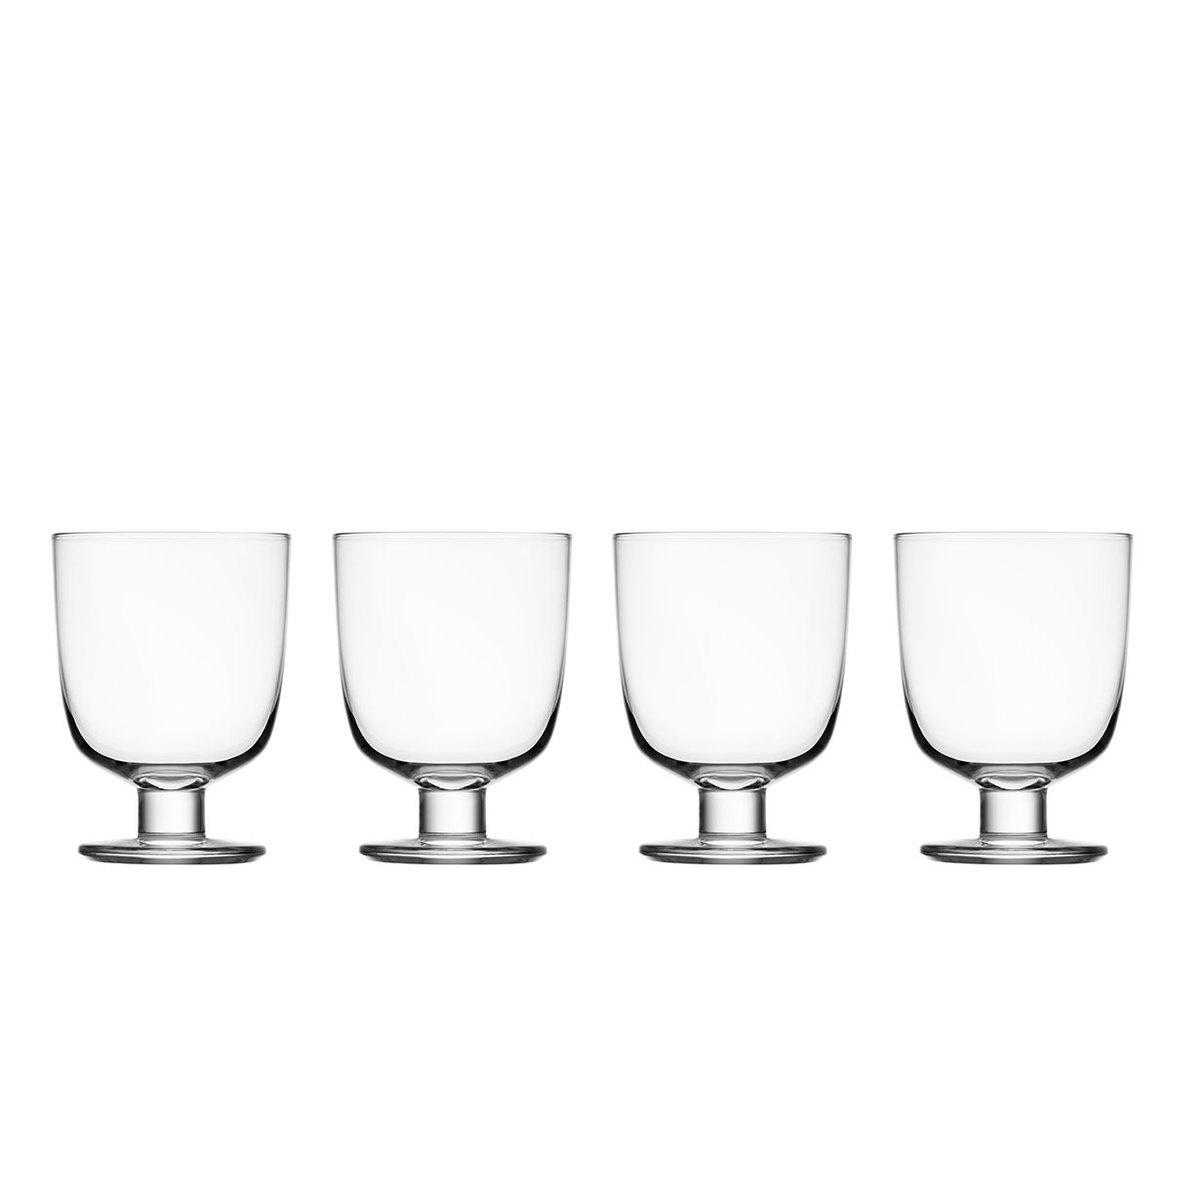 Lempi Set Of 4 Glasses By Iittala